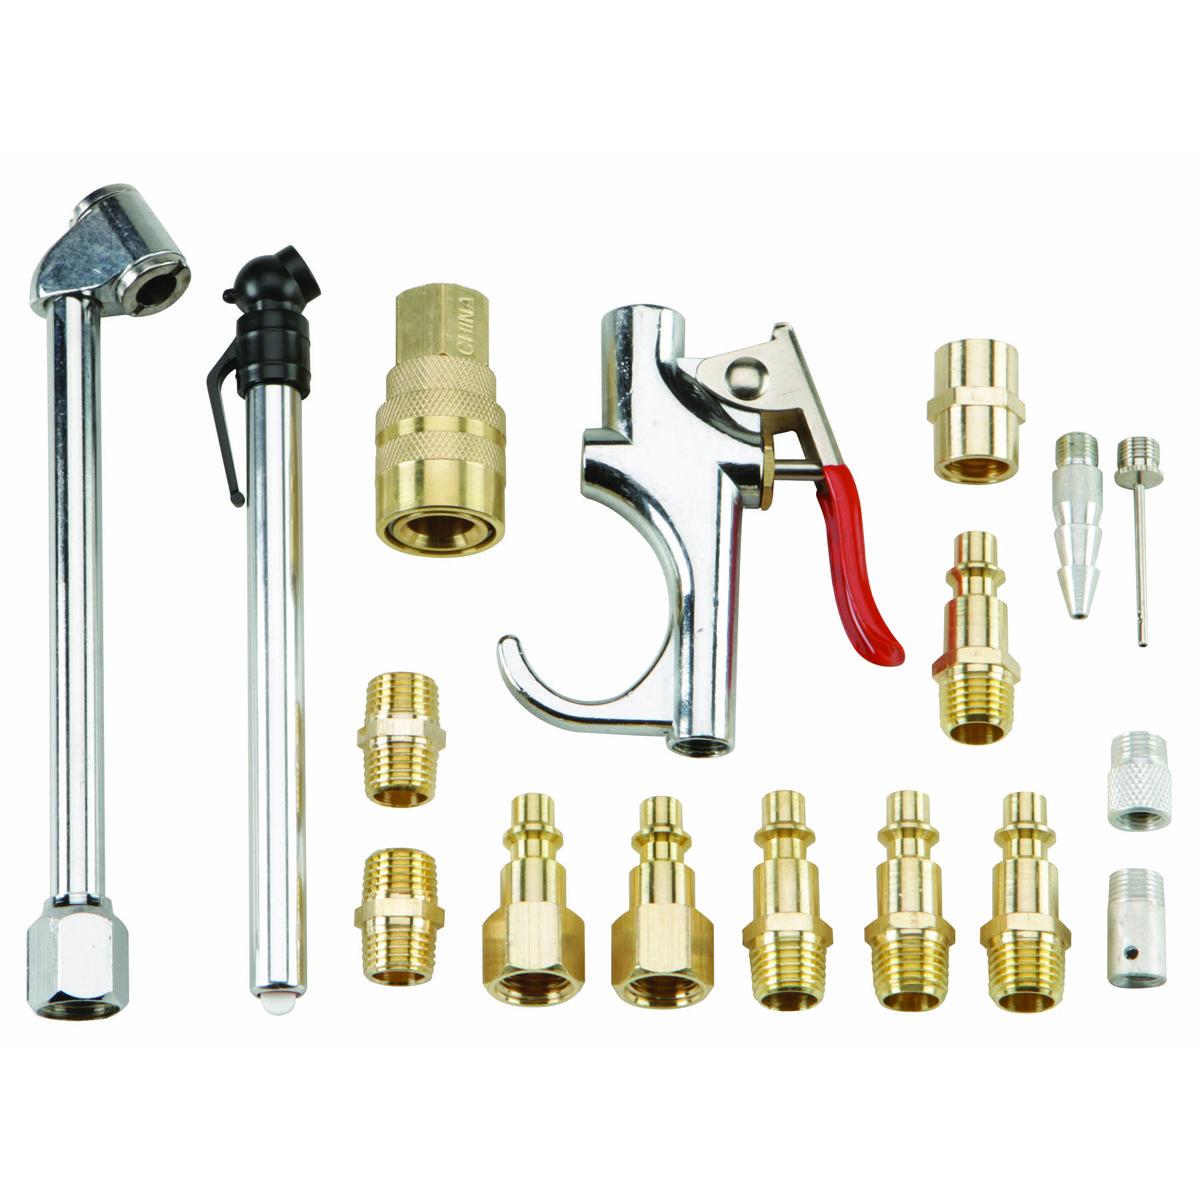 17 Piece Air Tool Accessory Kit Air tools, Tool